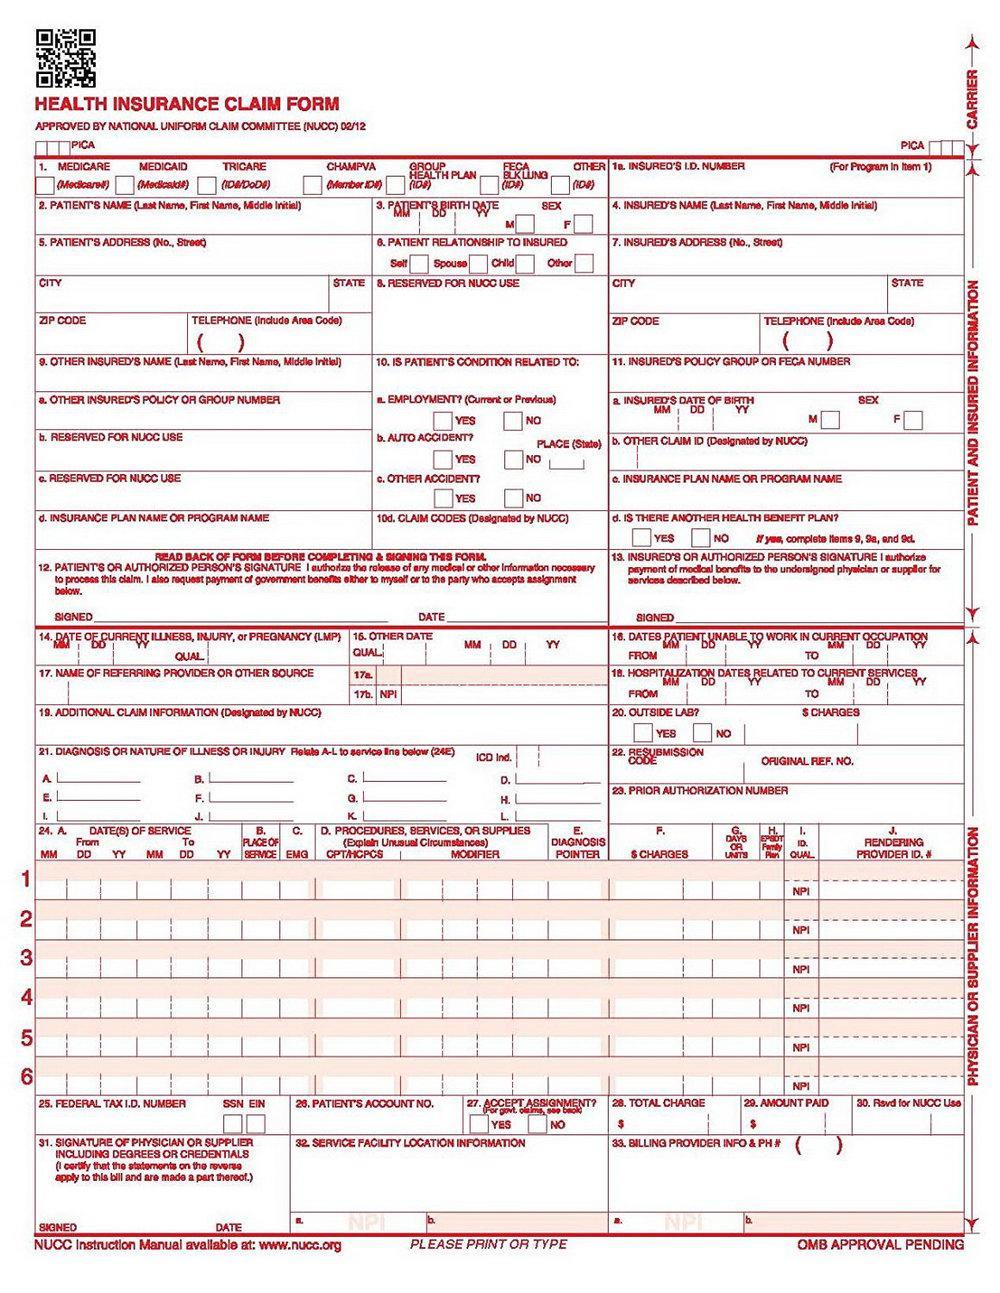 Hcfa Claim Form 2018